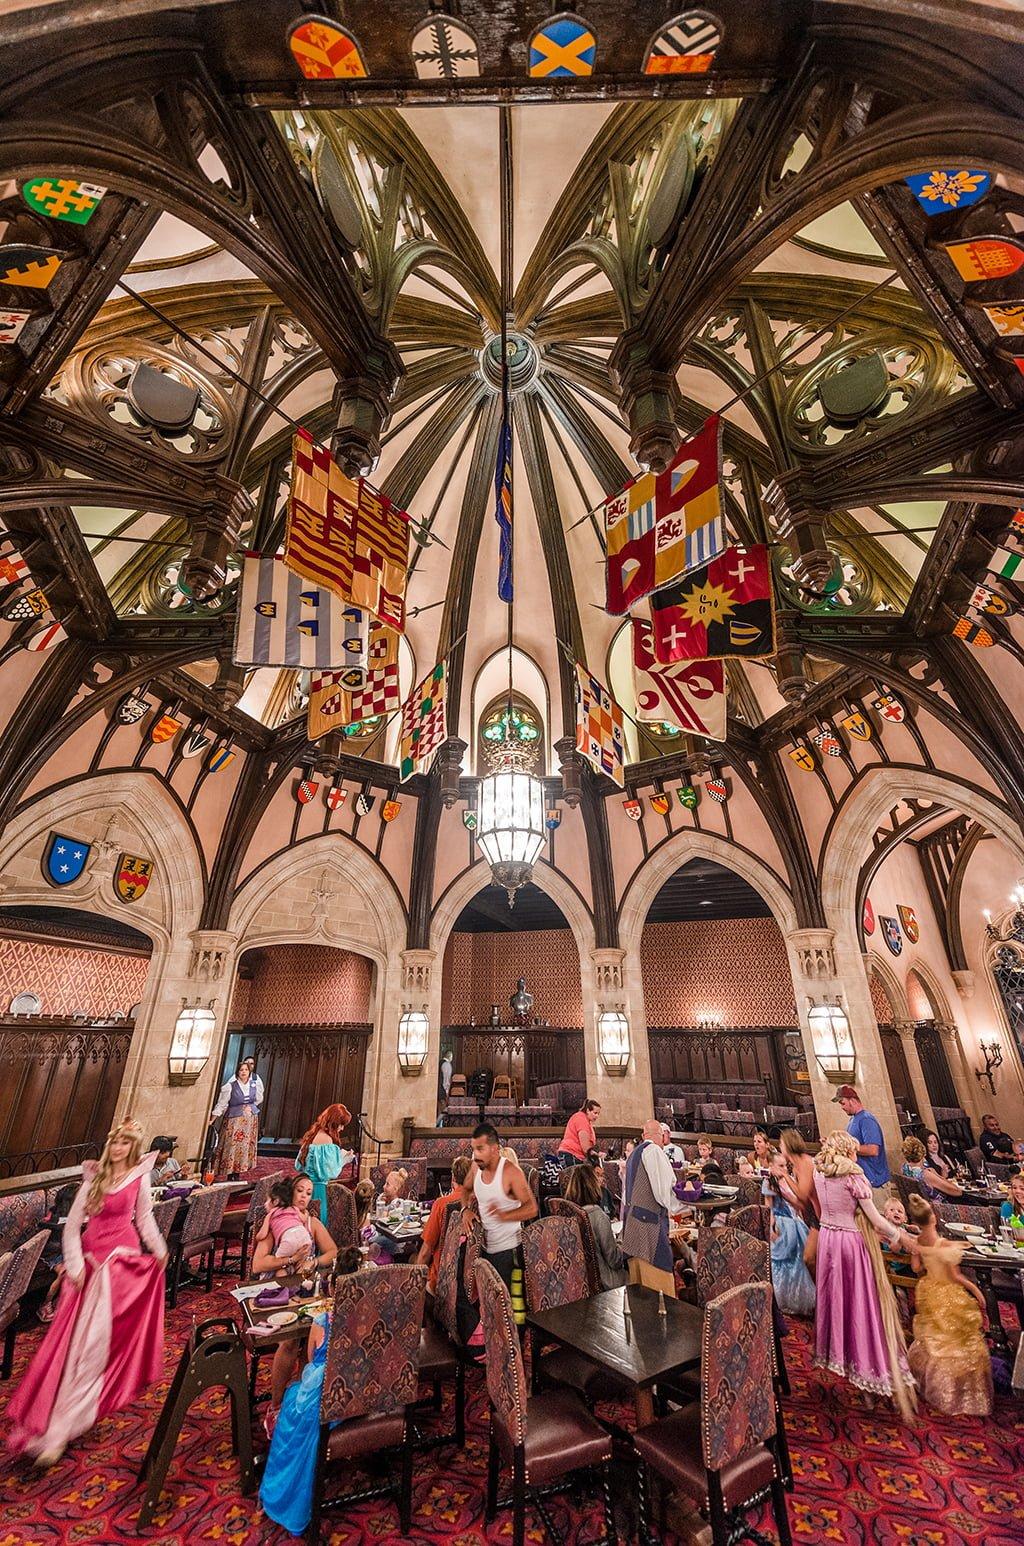 Cinderellas Royal Table Review Disney Tourist Blog - Cinderella's royal table prices